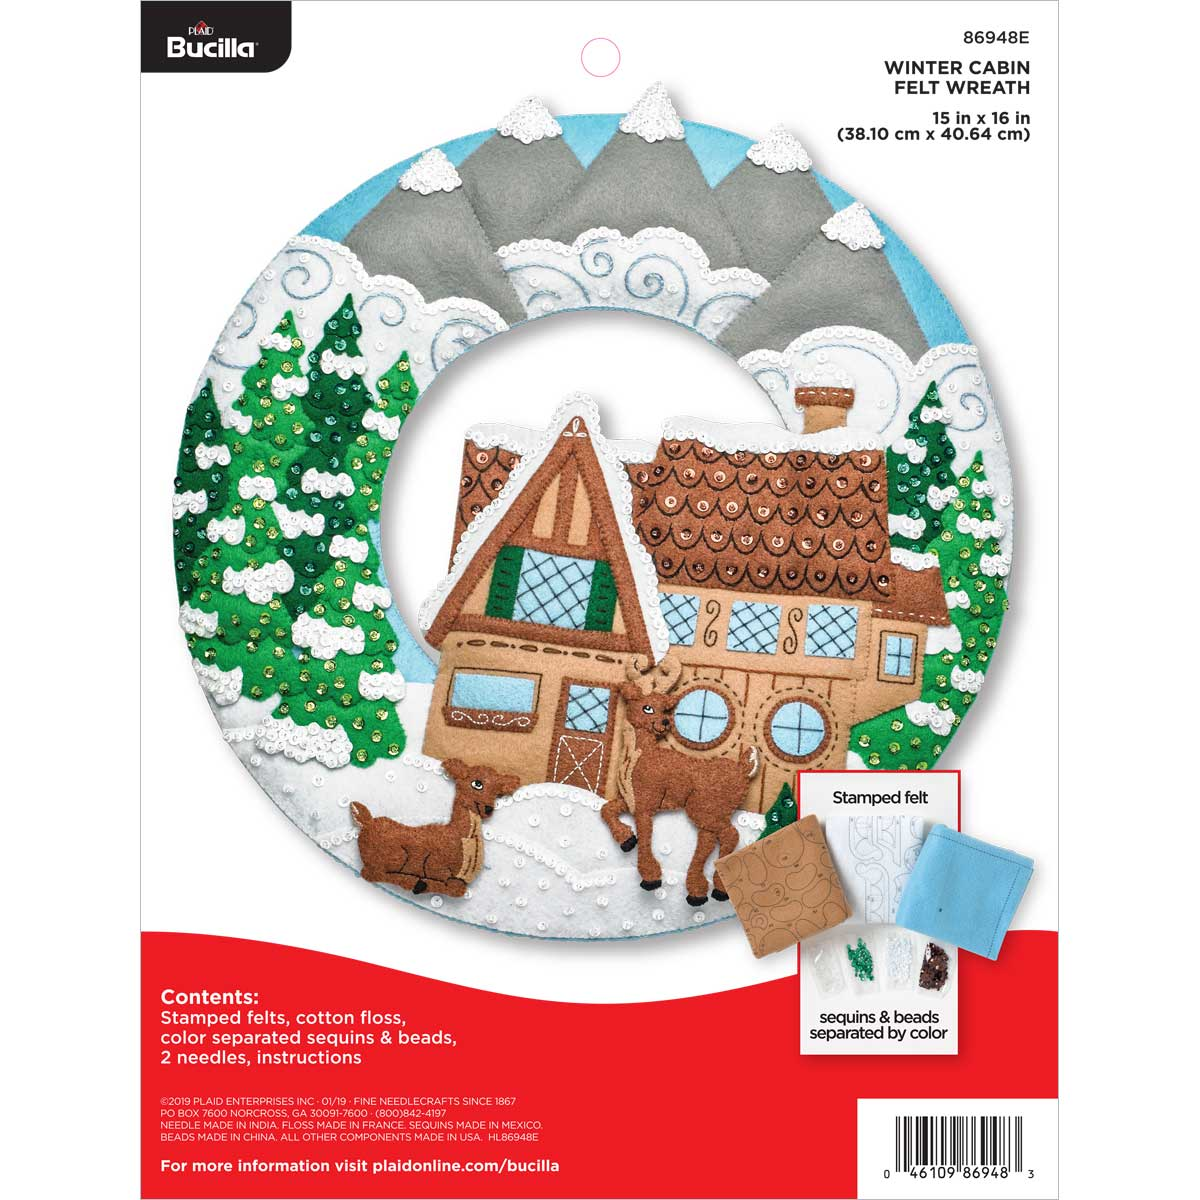 Bucilla ® Seasonal - Felt - Home Decor - Winter Cabin Wreath